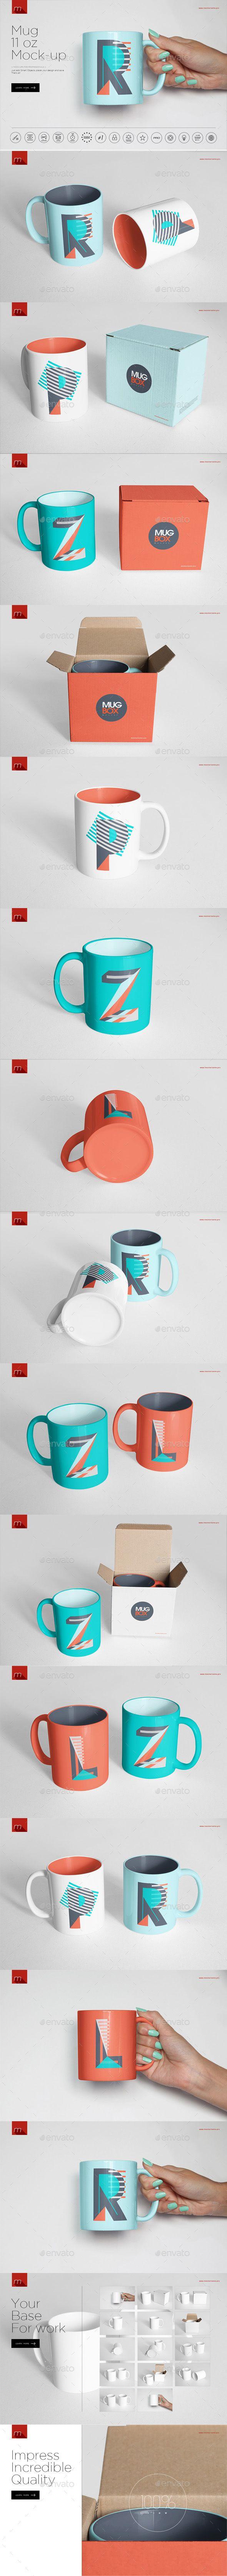 Mug 11 oz Mockup  — PSD Template #coffee #corporate • Download ➝ https://graphicriver.net/item/mug-11-oz-mockup/18308444?ref=pxcr